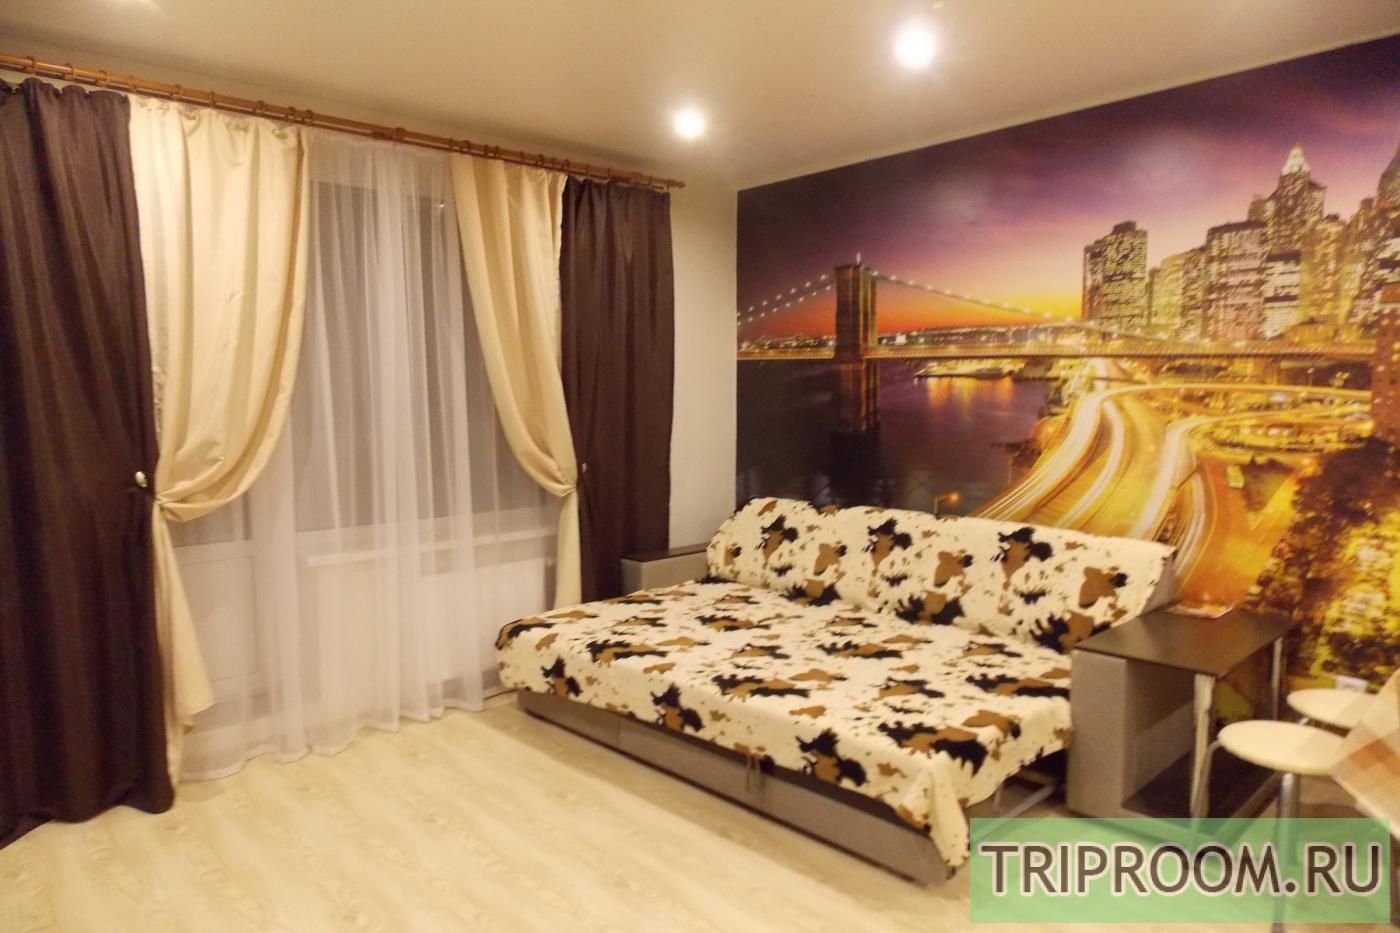 1-комнатная квартира посуточно (вариант № 14659), ул. Московский проспект, фото № 2